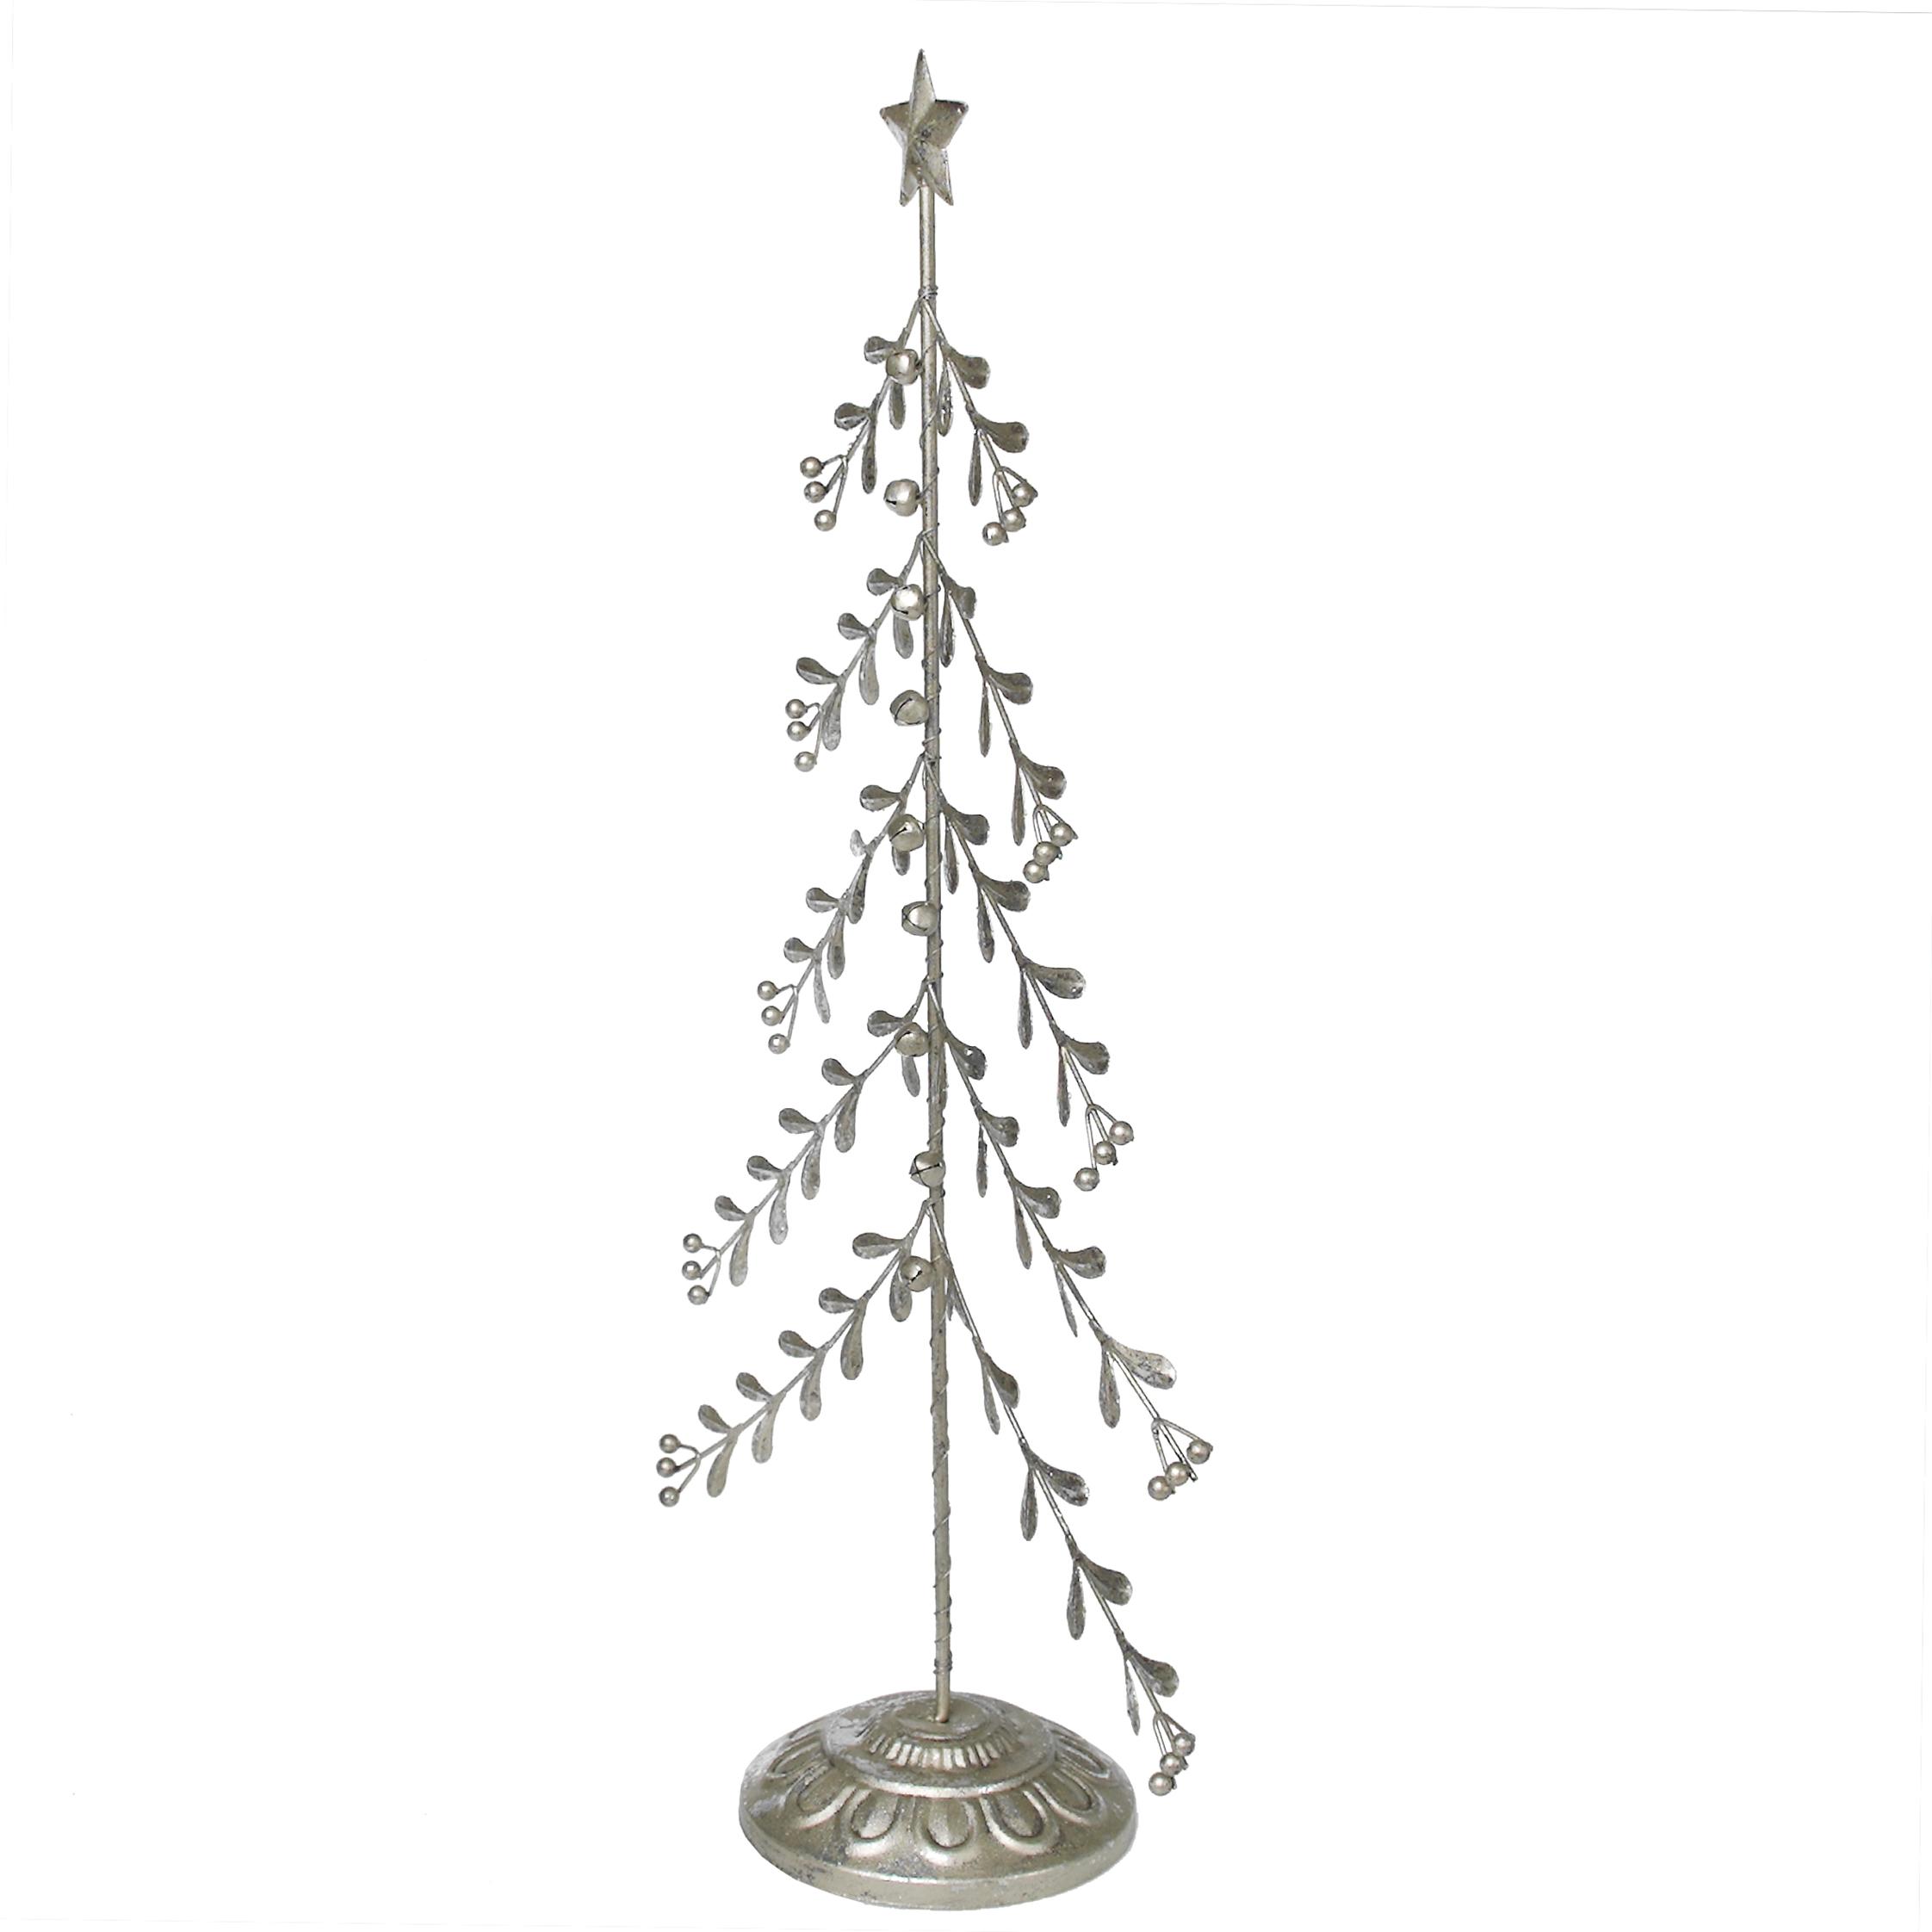 Silver Mistletoe Christmas Tree With Bells